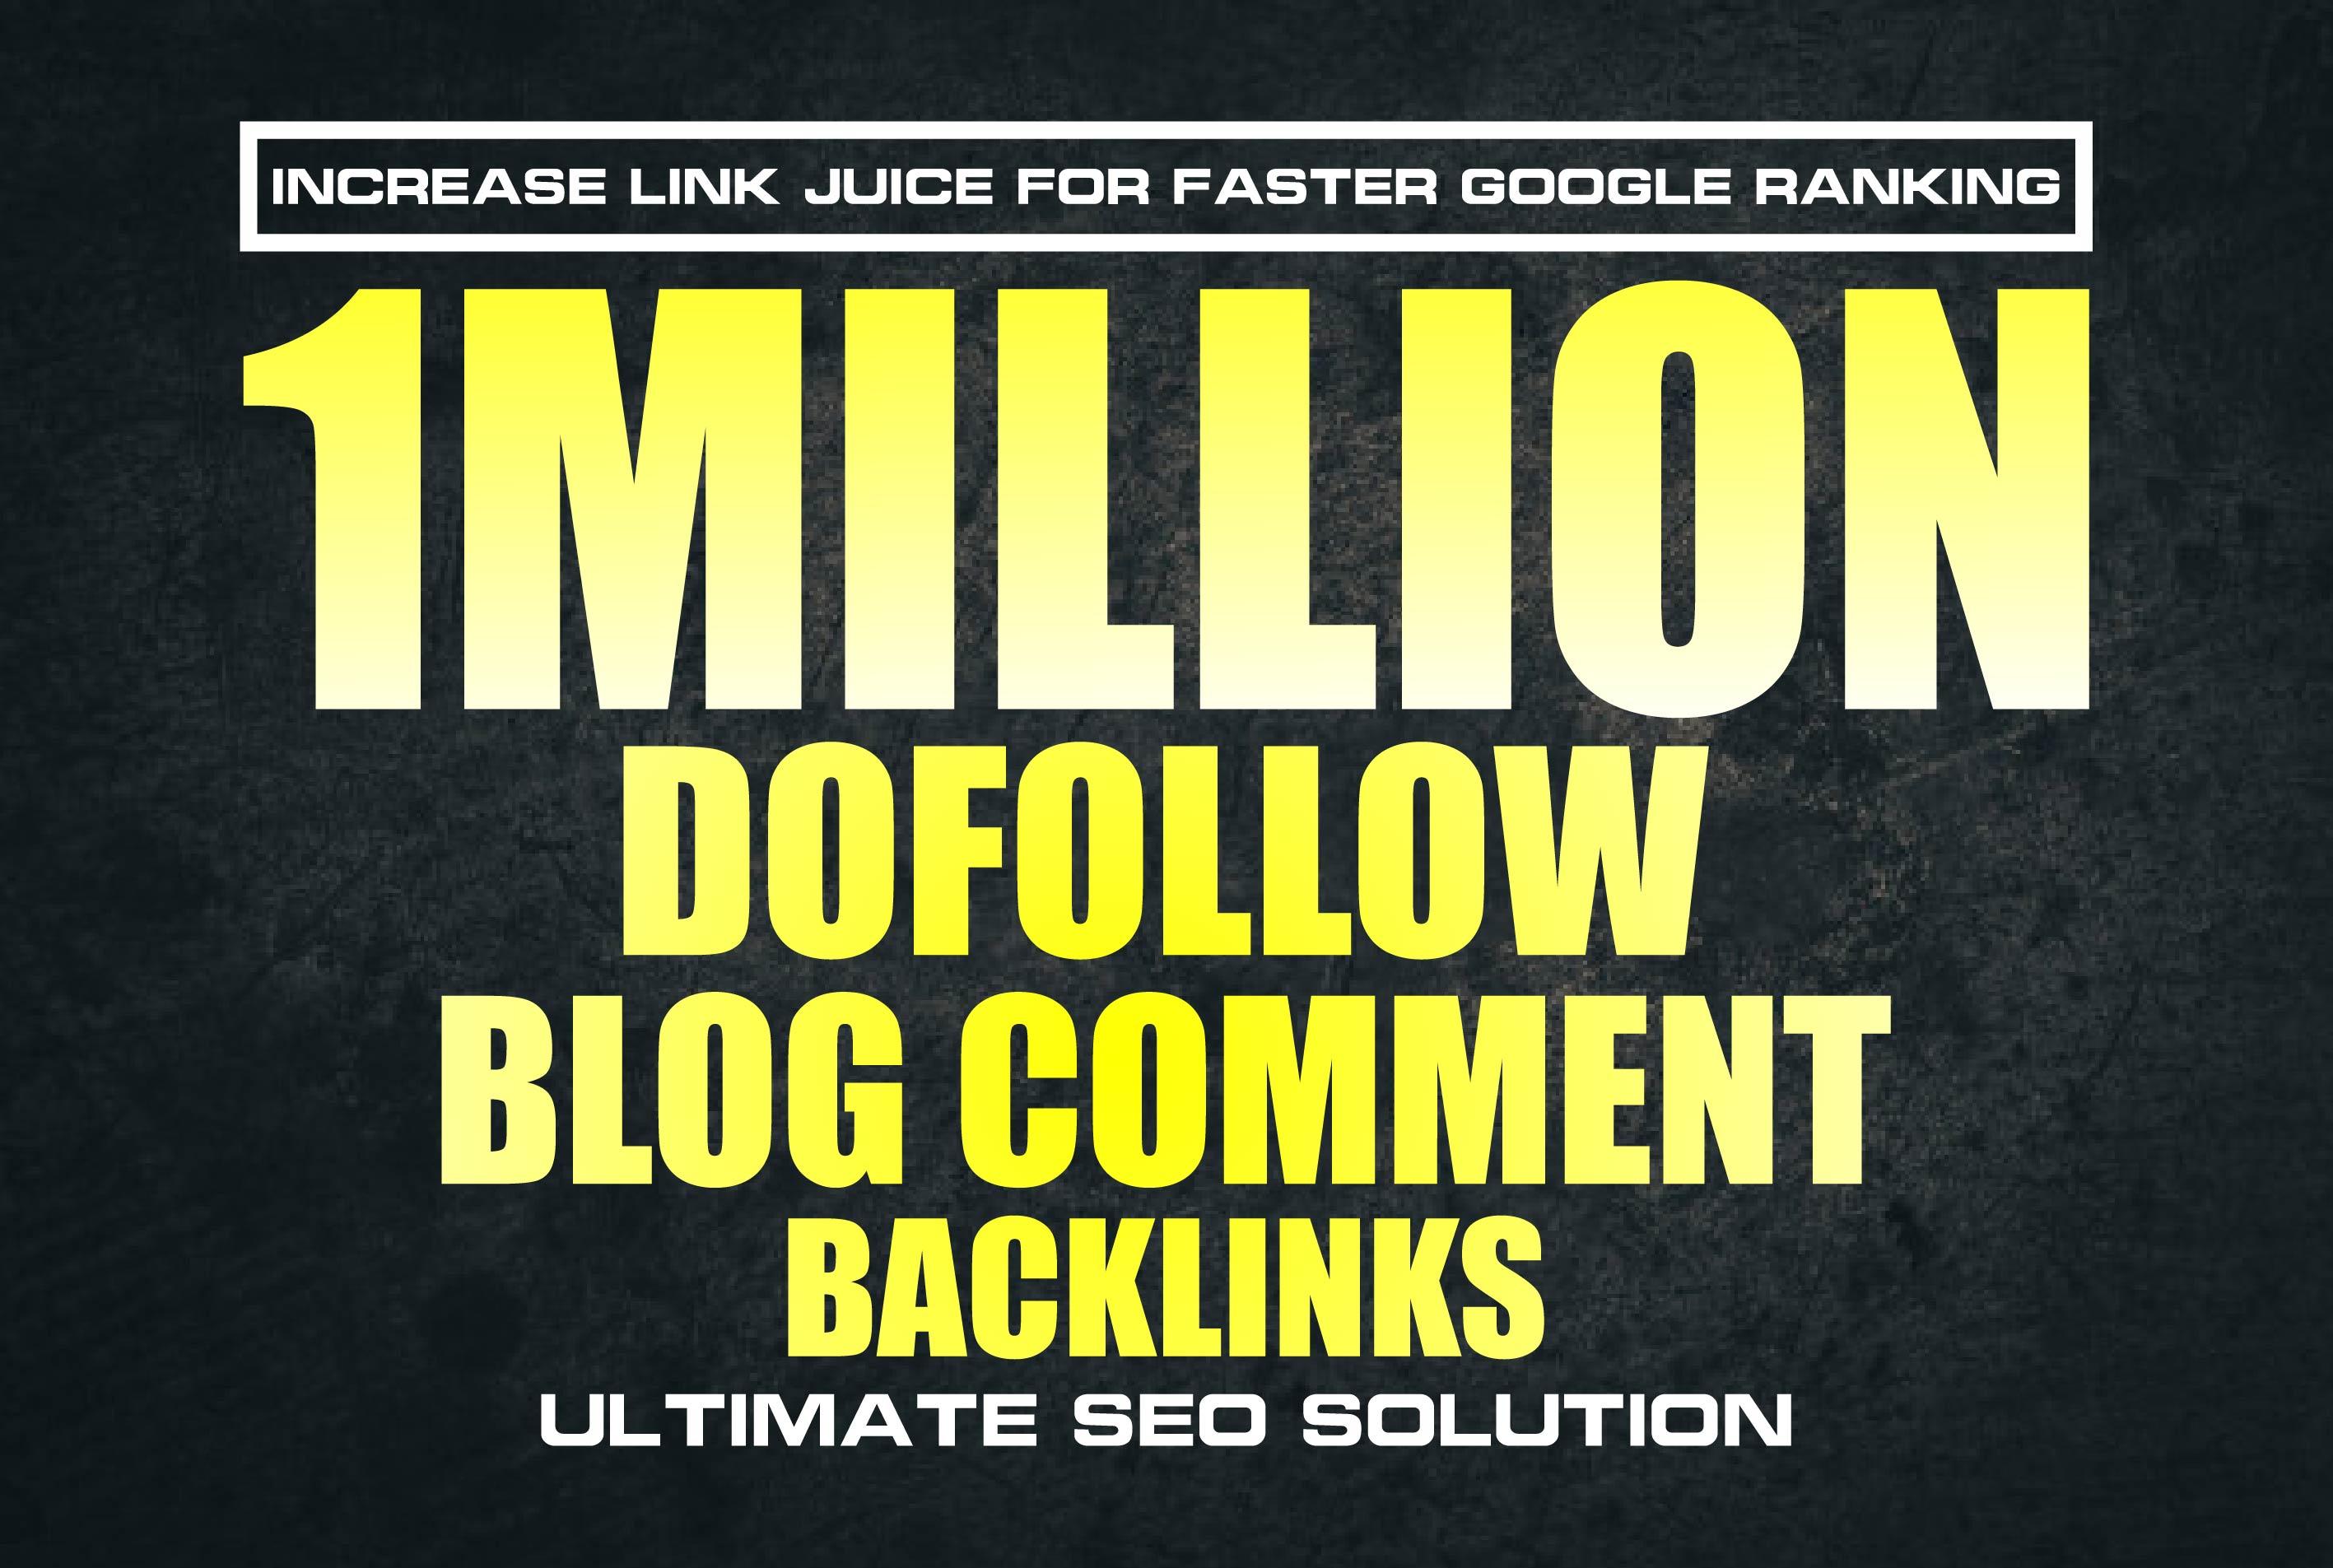 I will build 1million Dofollow Blog Comment Backlinks